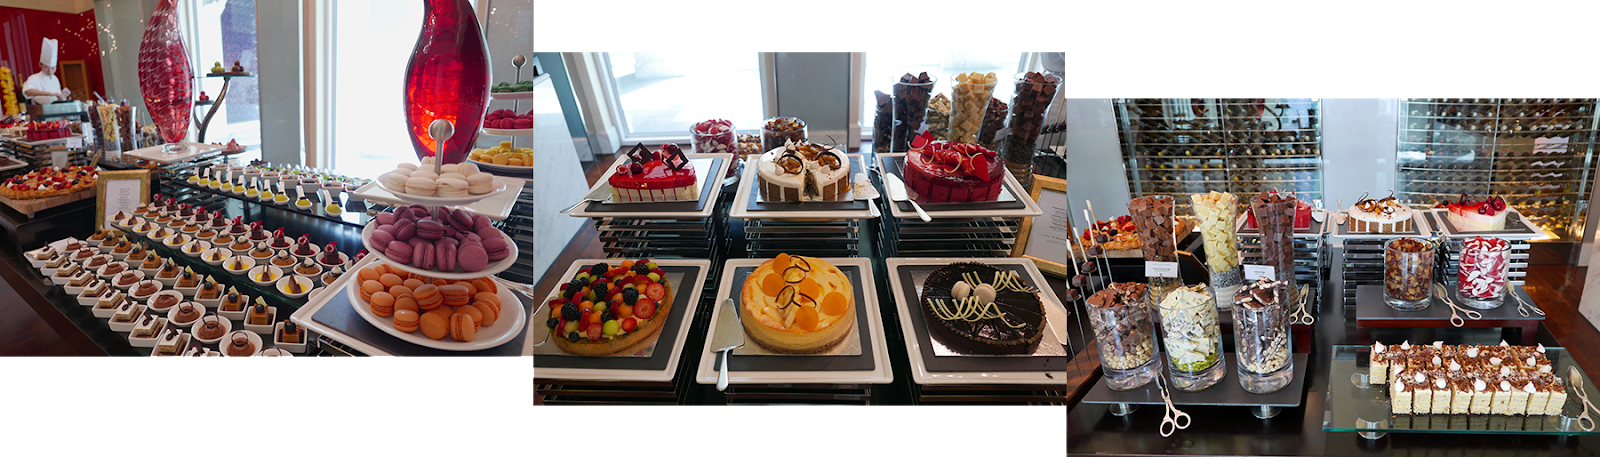 Euriental   luxury travel & style   Brunch at Traiteur, Park Hyatt Dubai